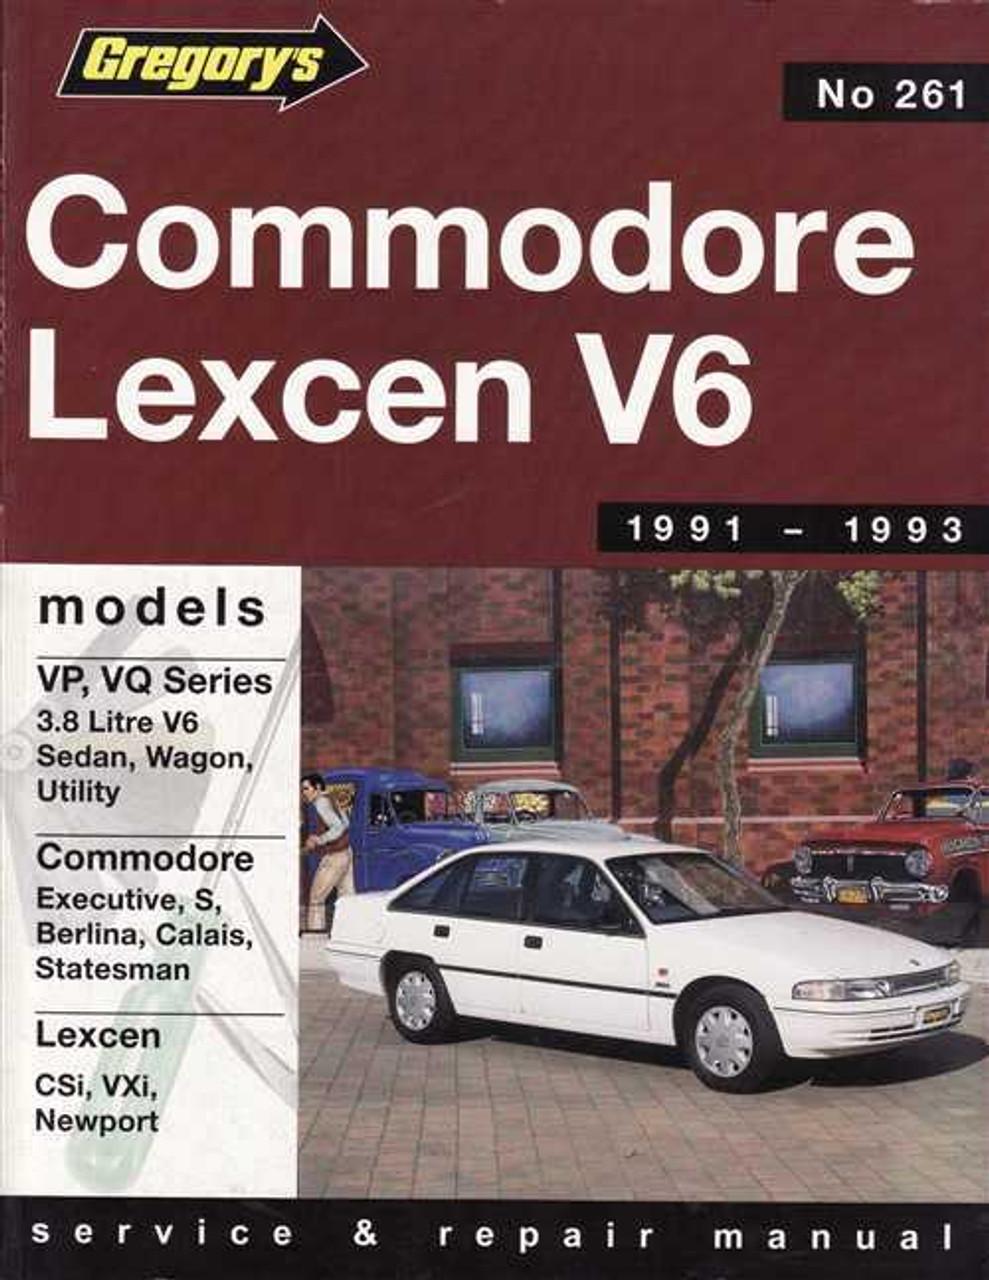 holden commodore amp toyota lexcen v6 1991 1993 workshop manual rh automotobookshop com au vr commodore repair manual vr commodore workshop manual pdf